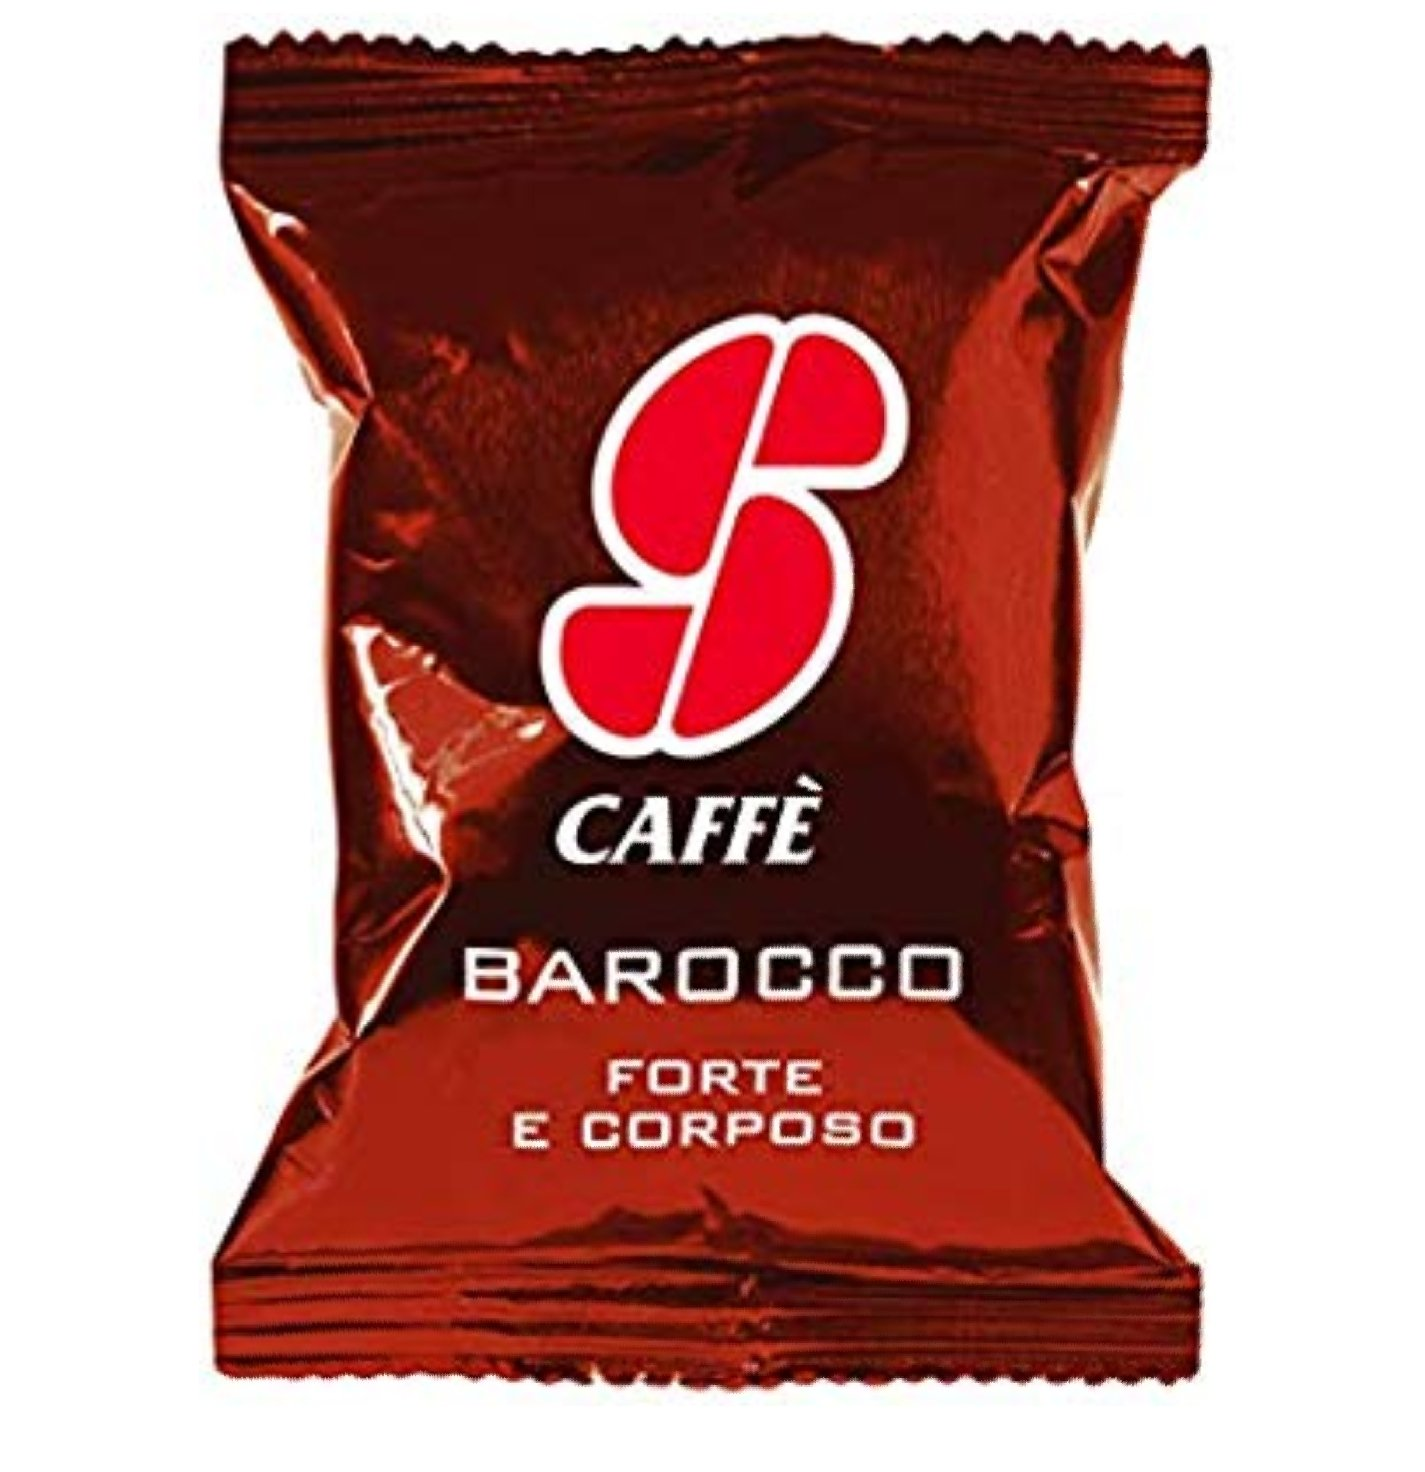 100 CAPSULE ESSSE CAFFE' MISCELA BAROCCO